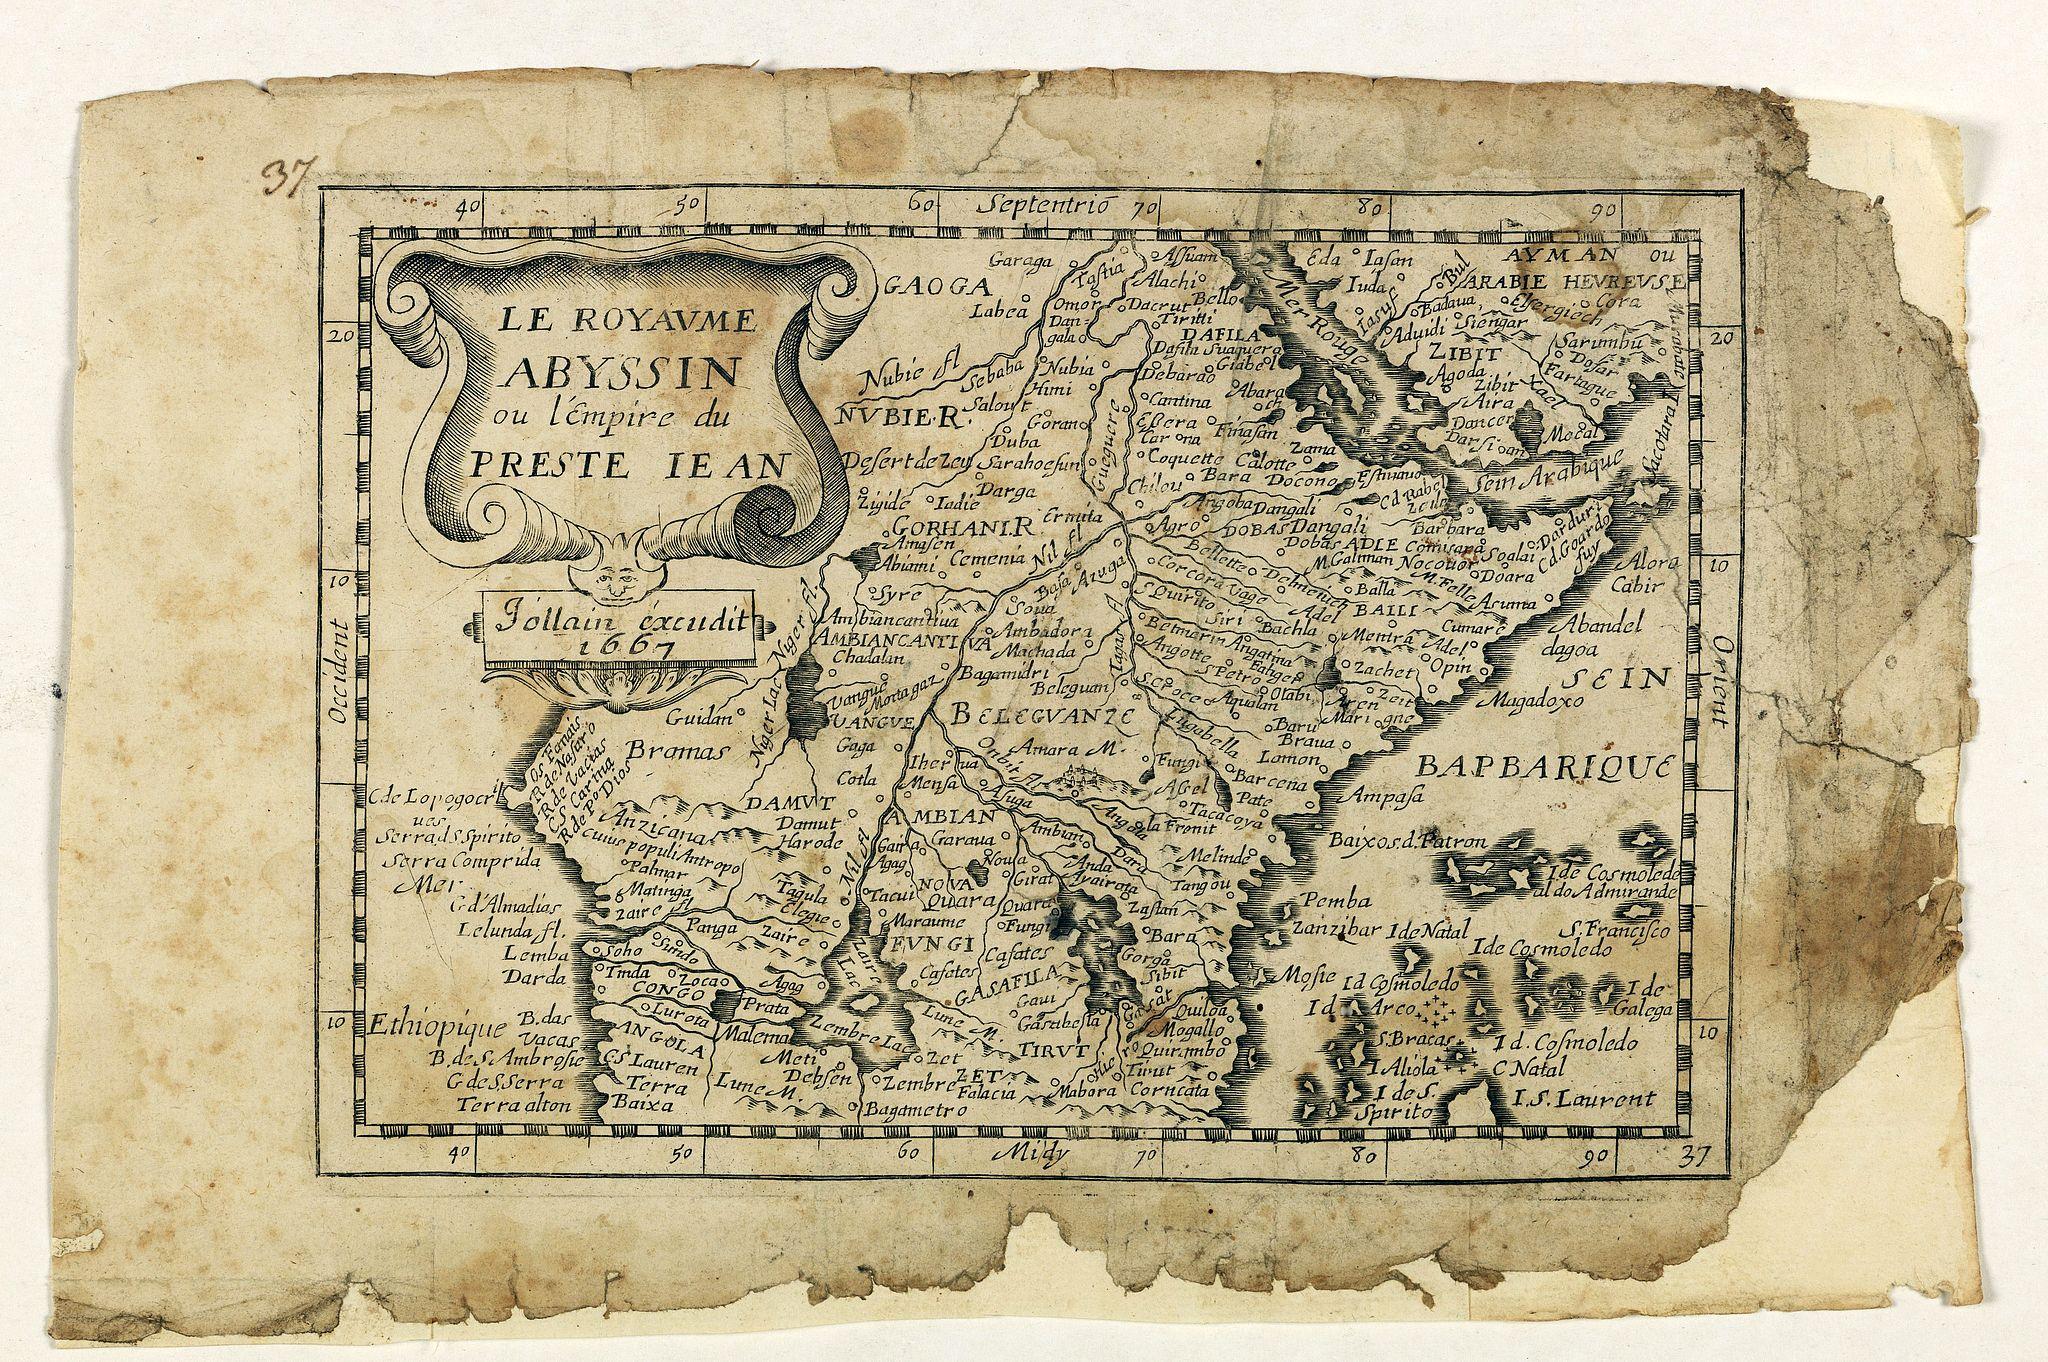 JOLLAIN, G. -  Le Royaume Abyssin ou l'Empire du Presteiean.